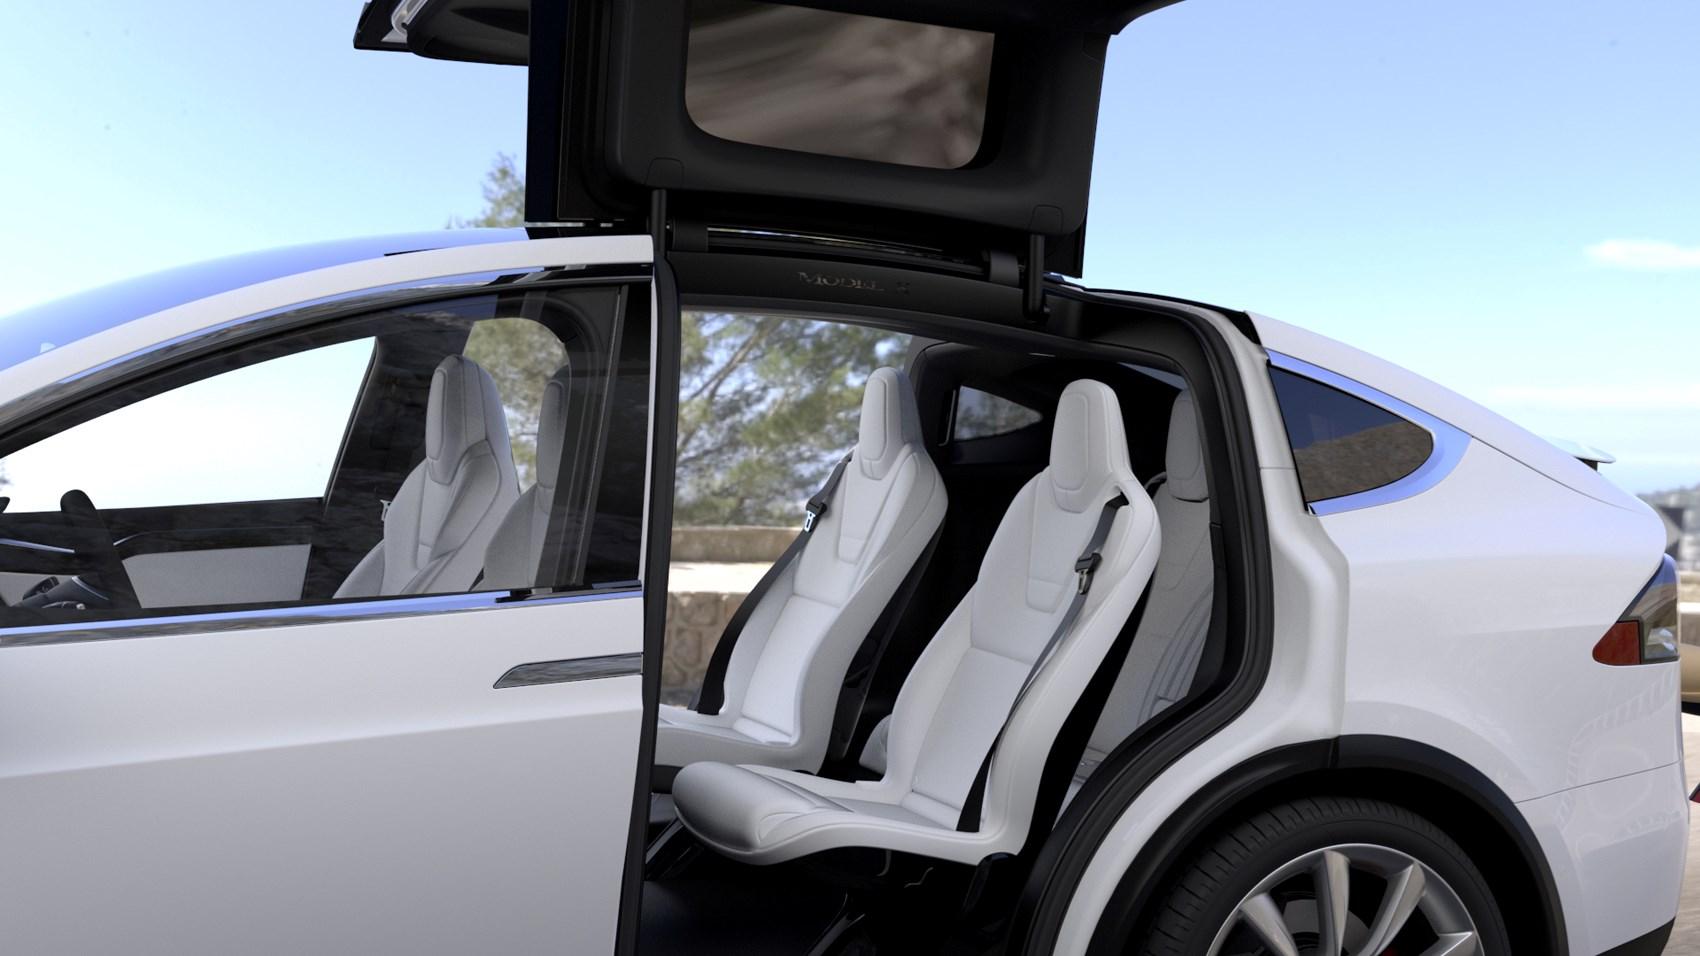 2016 tesla model x small electric suv price range -  Tesla 2017 Model X Suv Interior Detail